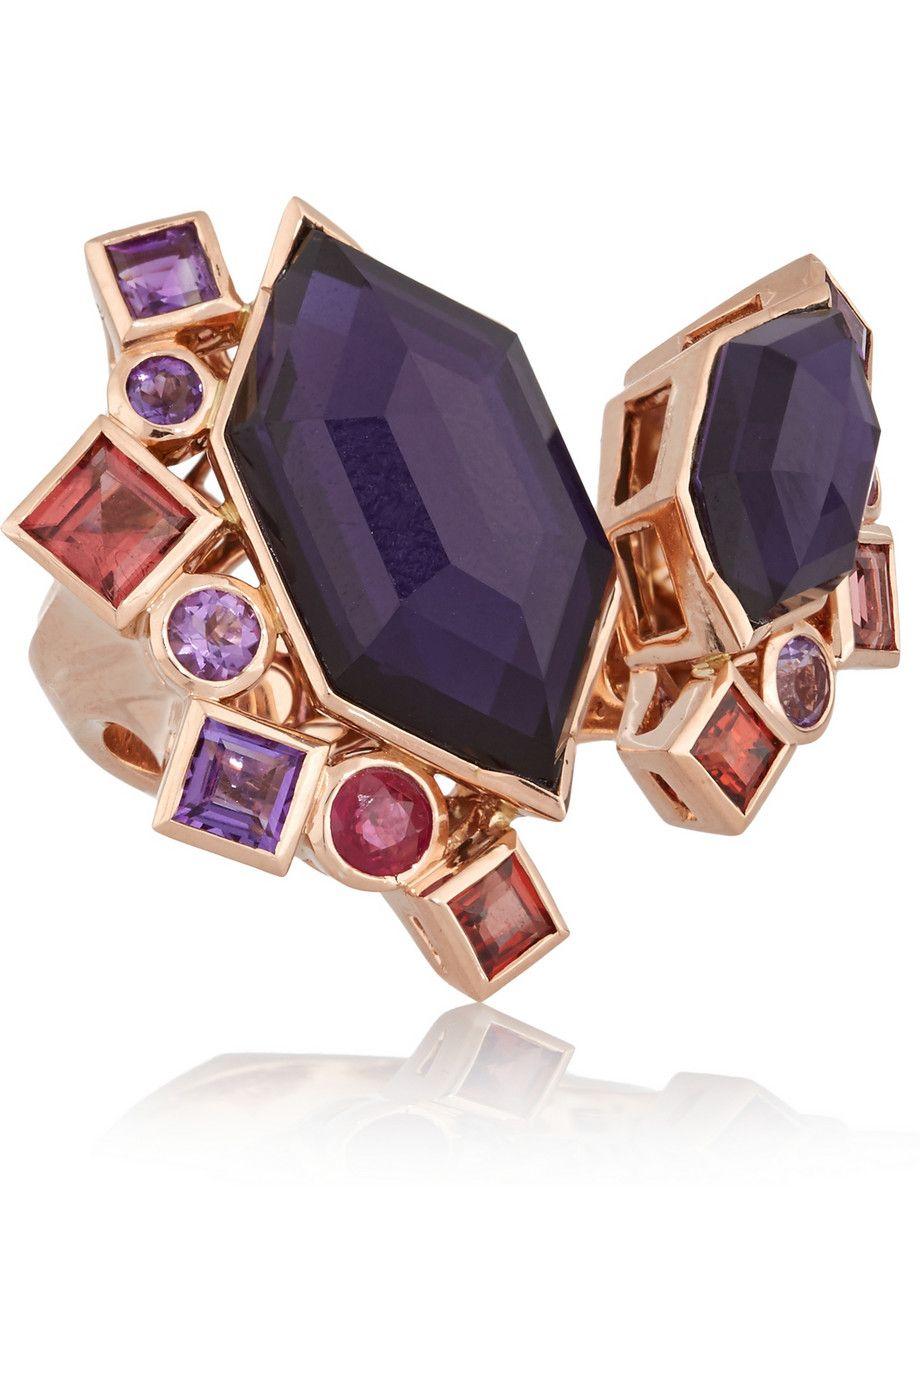 Stephen Webster Fly By Night 18-karat Rose Gold Multi-stone Ring bb9jmwhQj